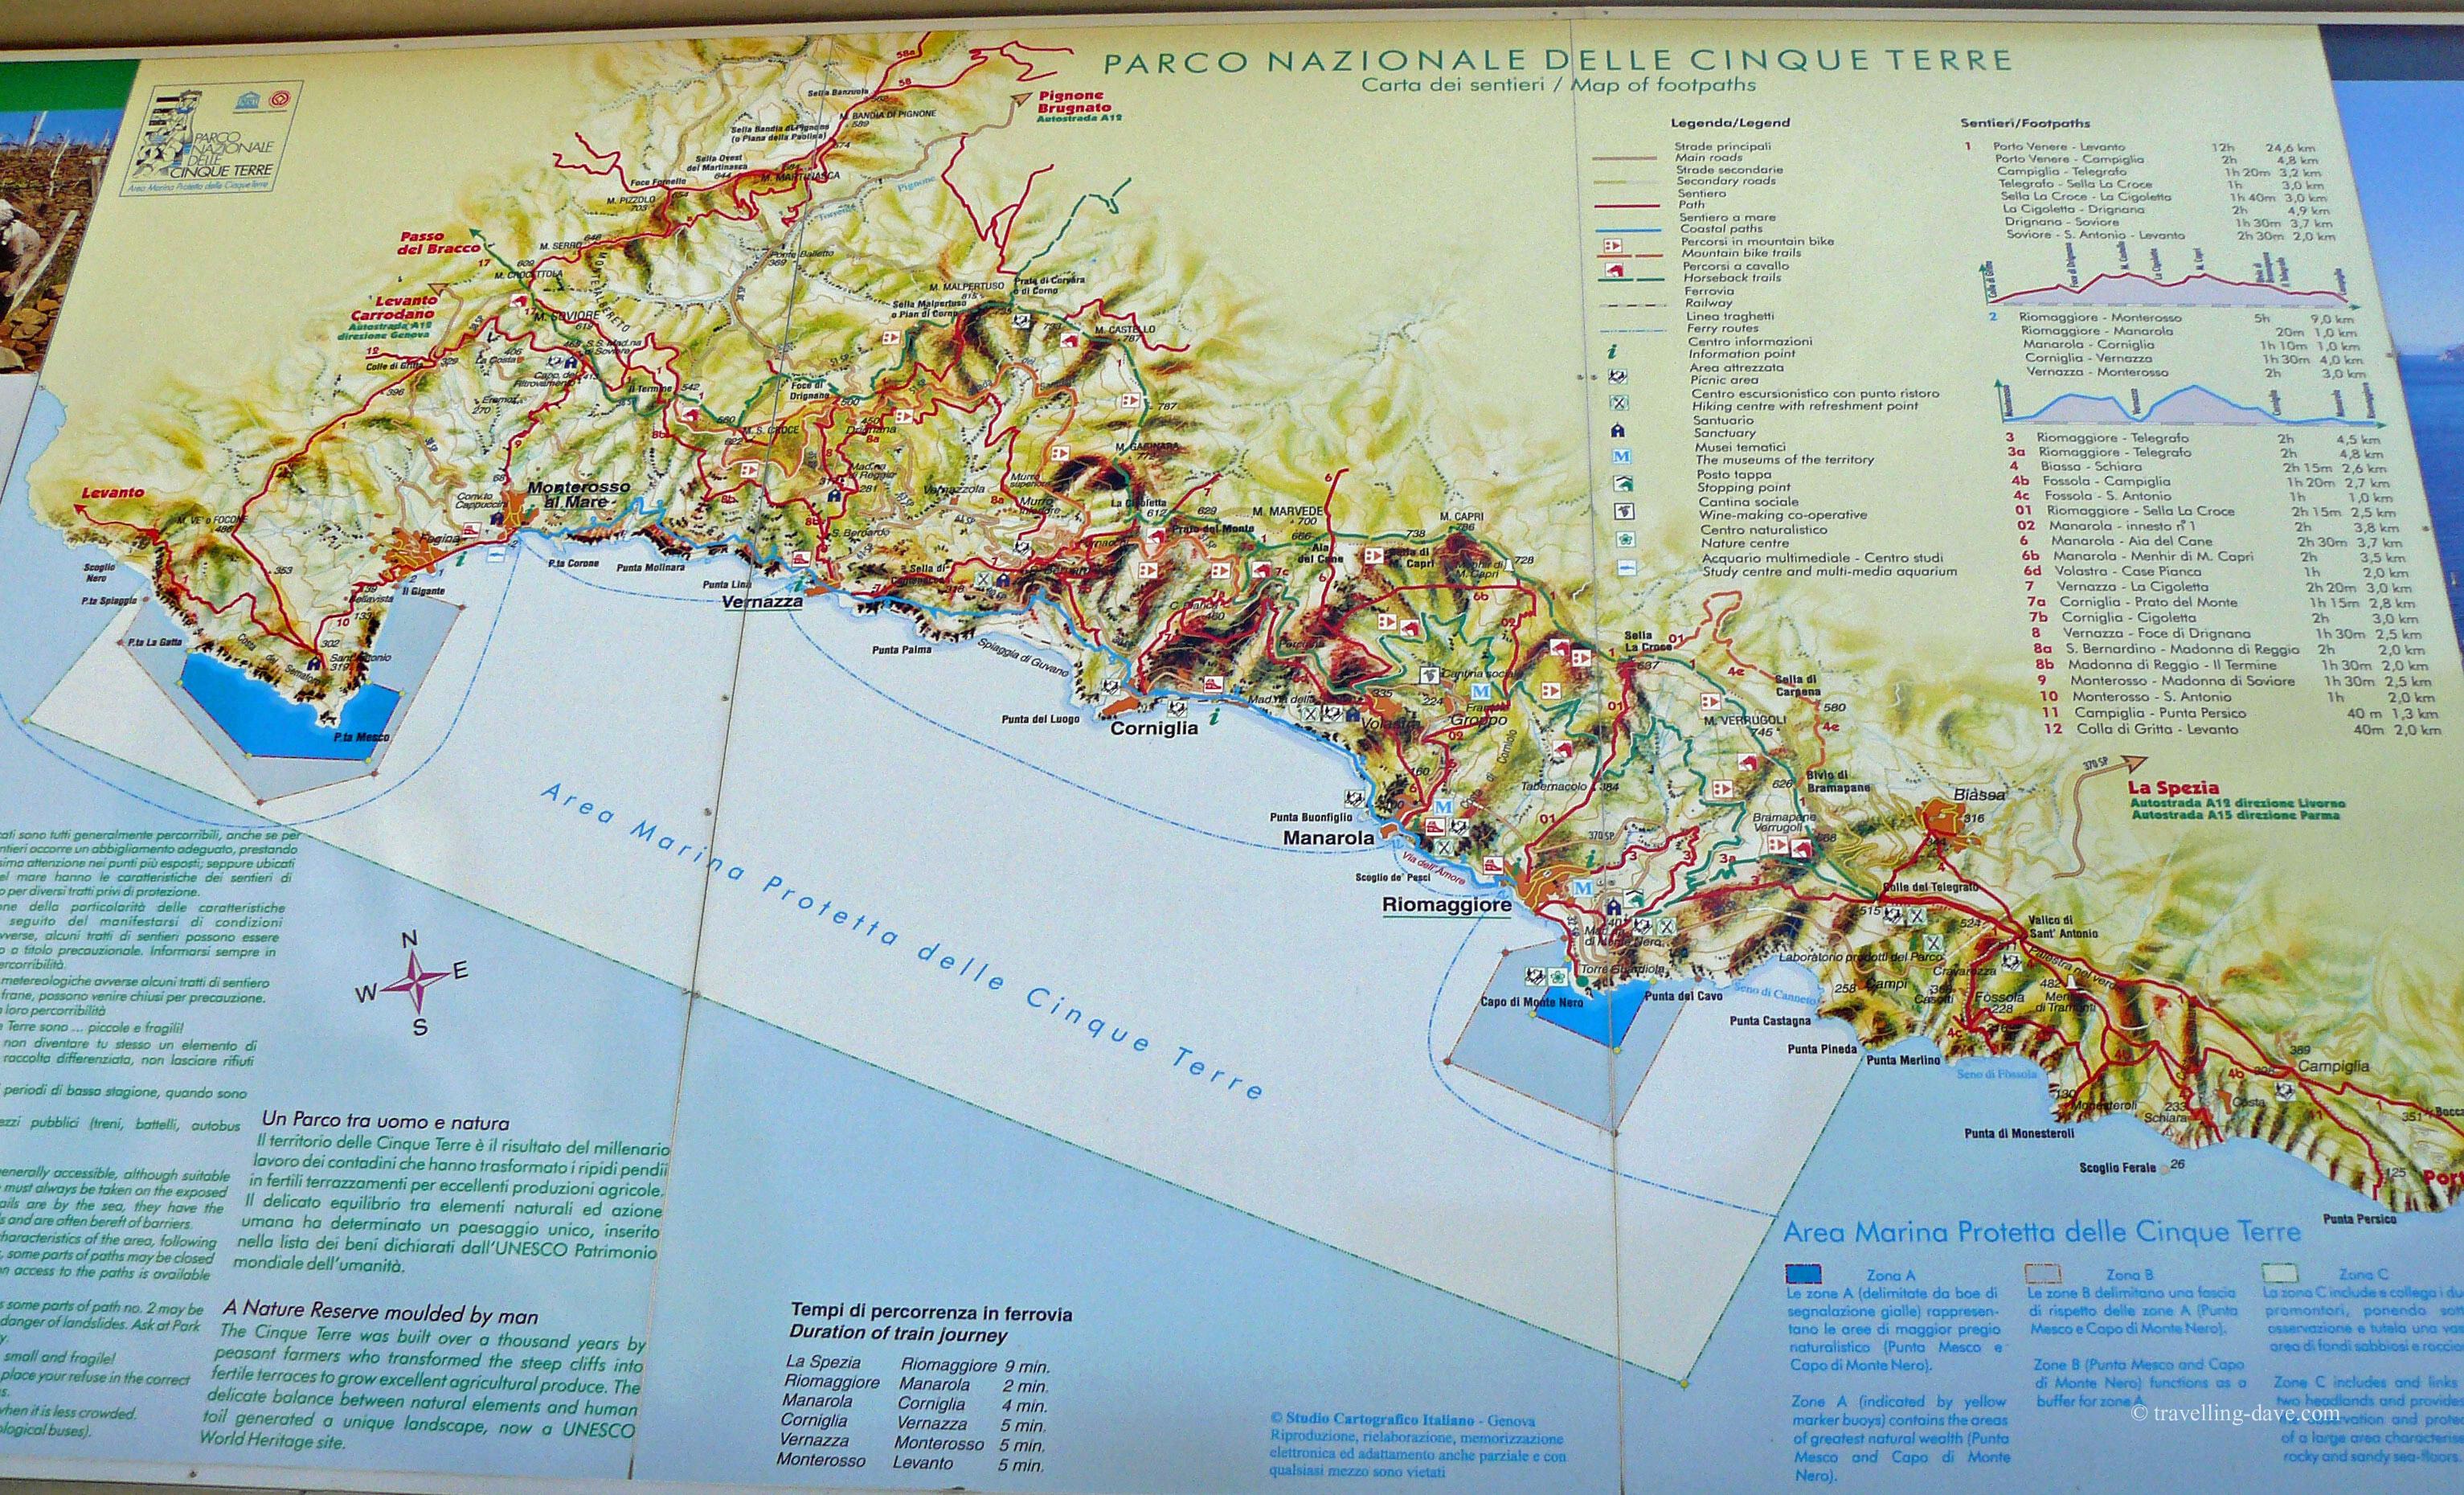 Photo of the Cinque Terre coast map